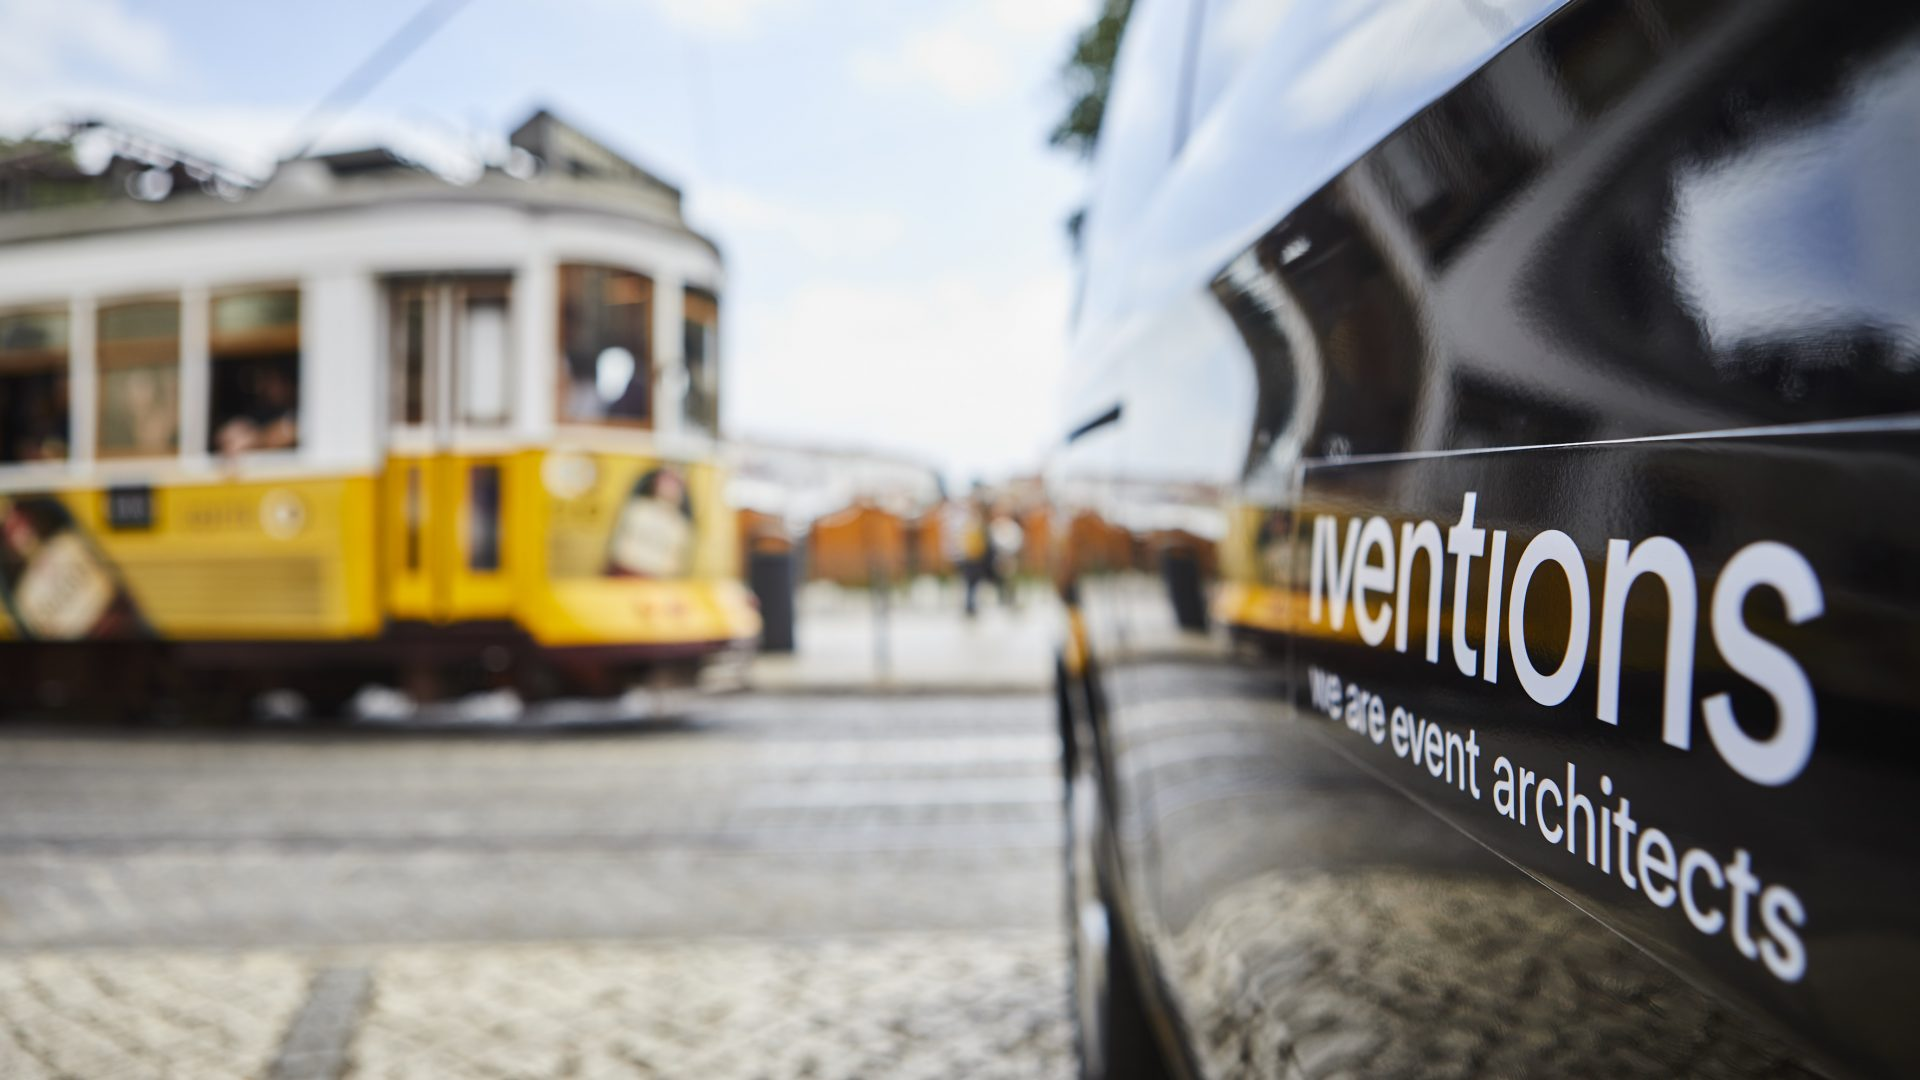 Yellow tramcar in Lisbon, Portugal